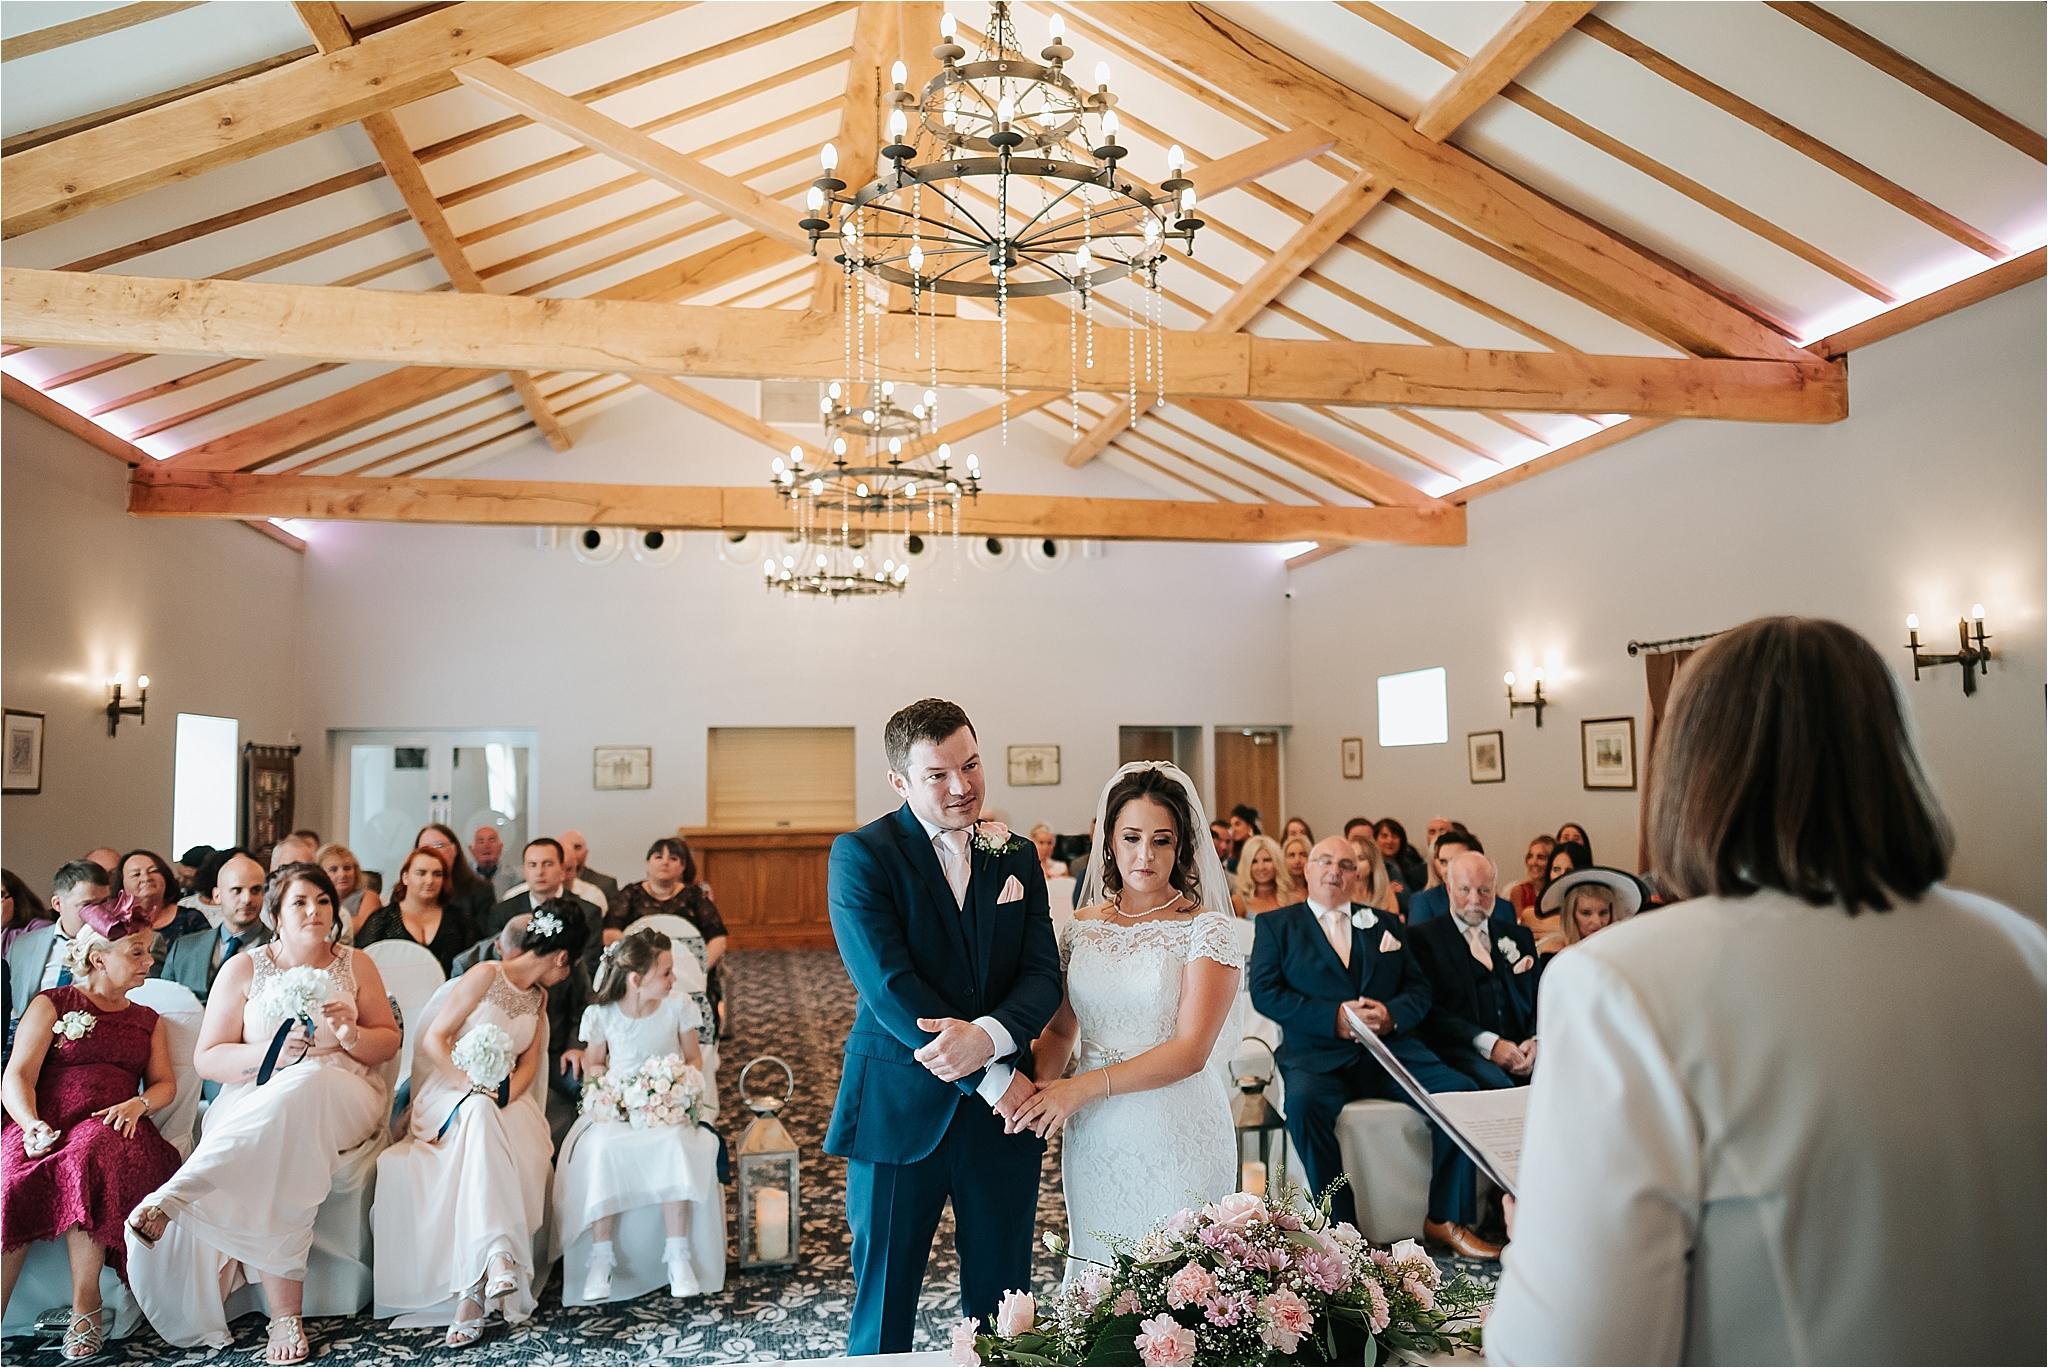 thevilla+lancashire+wreagreen+wedding+photographer97.jpg